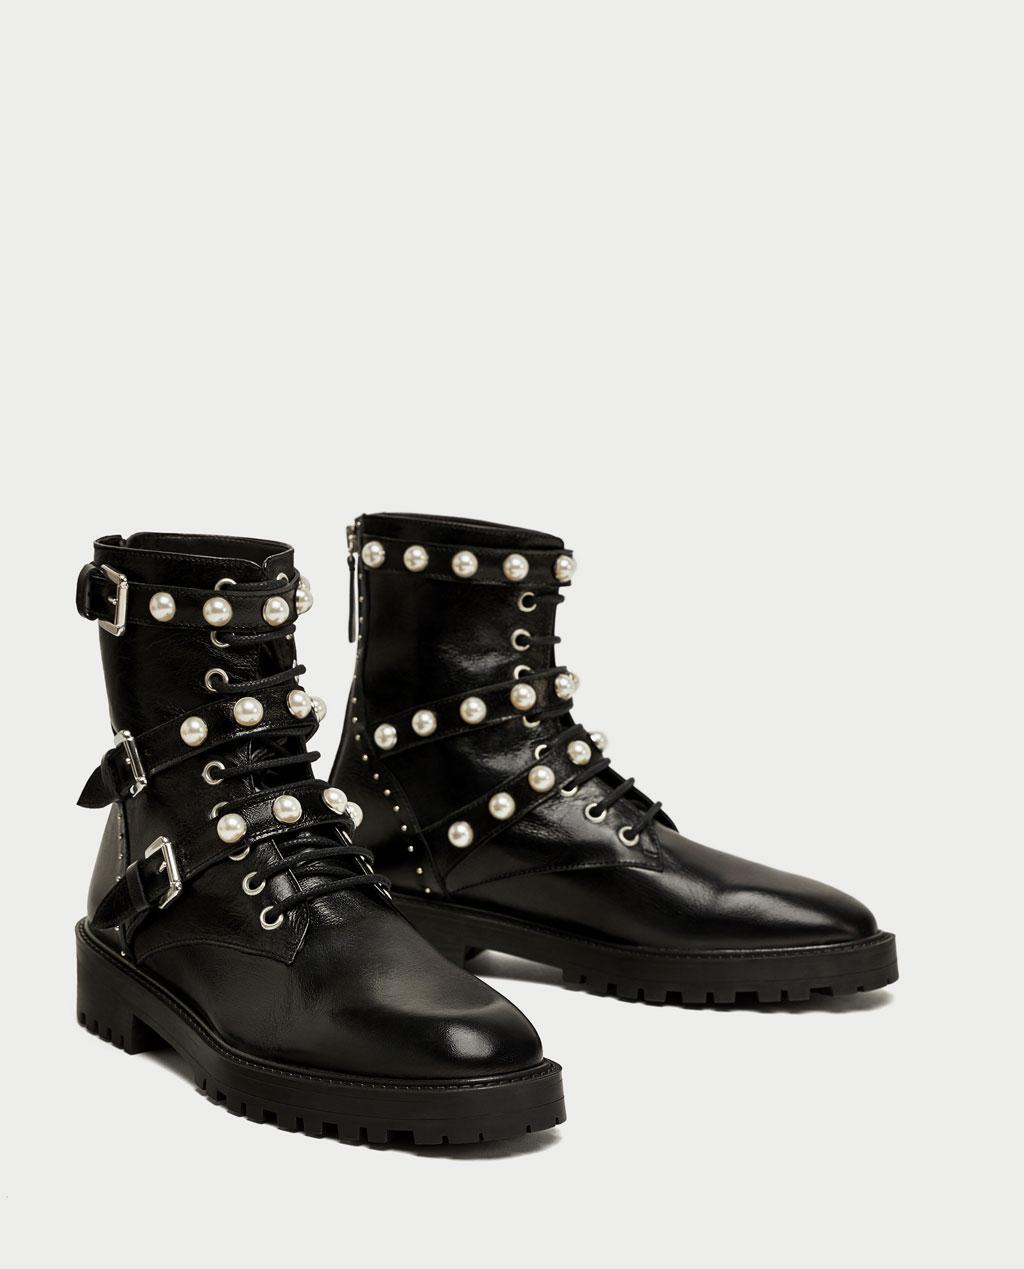 15 zapatos que parecen de dise ador que est n a tu alcance. Black Bedroom Furniture Sets. Home Design Ideas